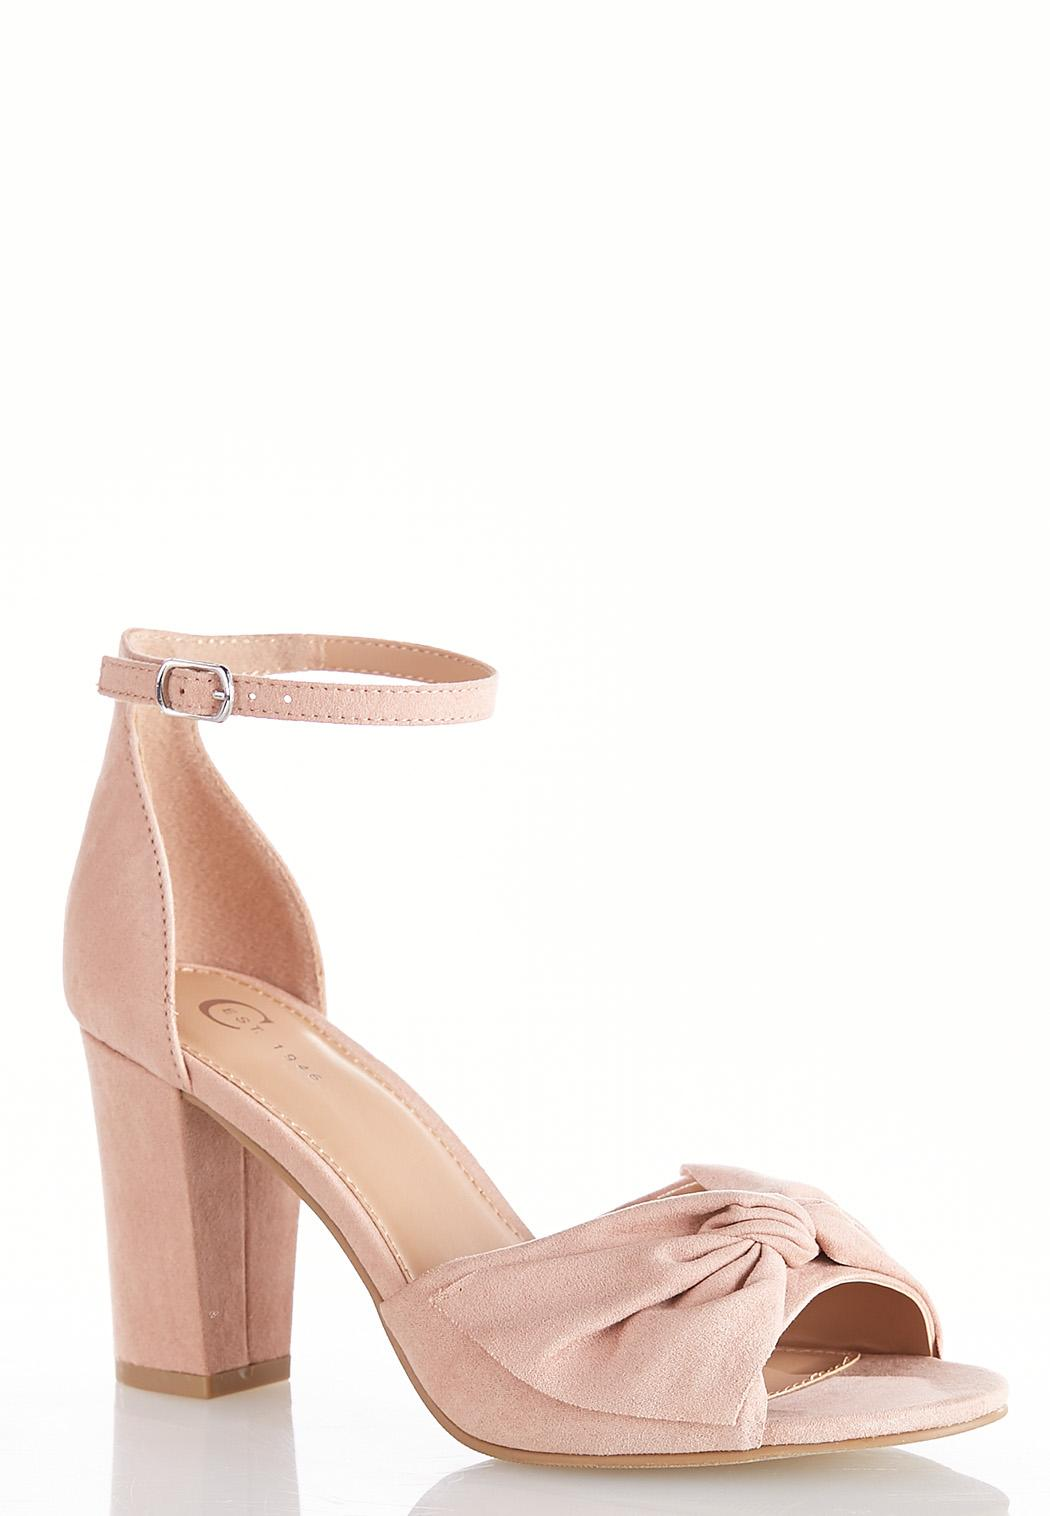 Bow Vamp Heeled Sandals